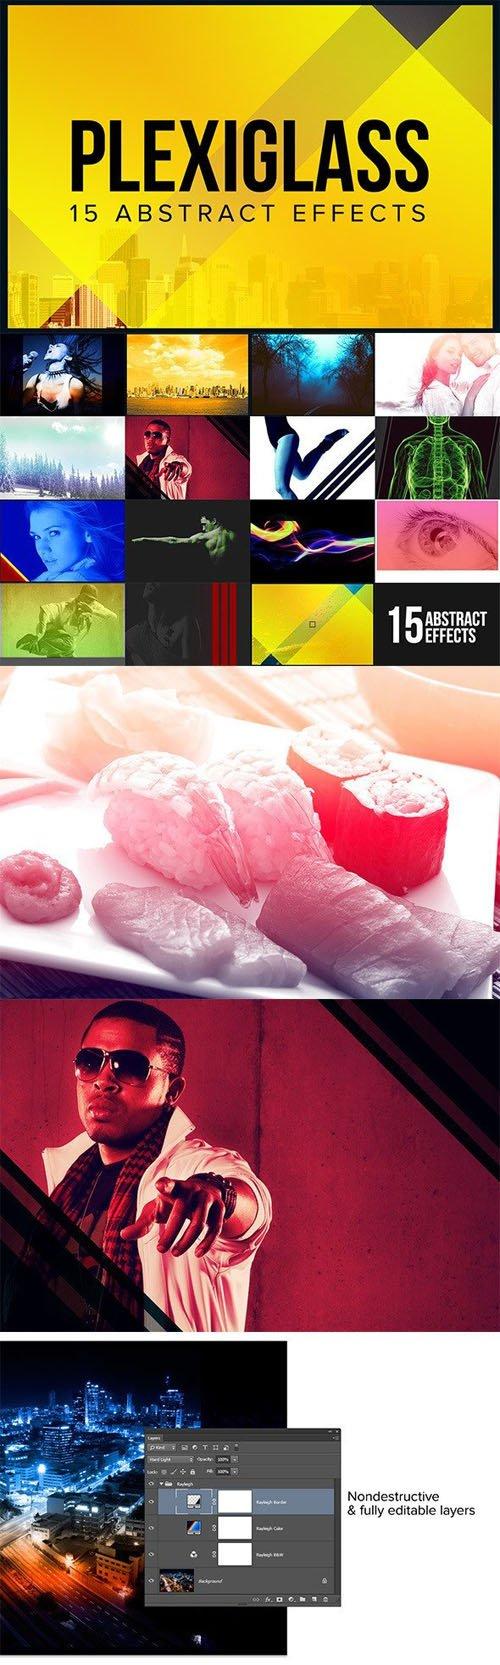 15 Abstract Effects - Plexiglass